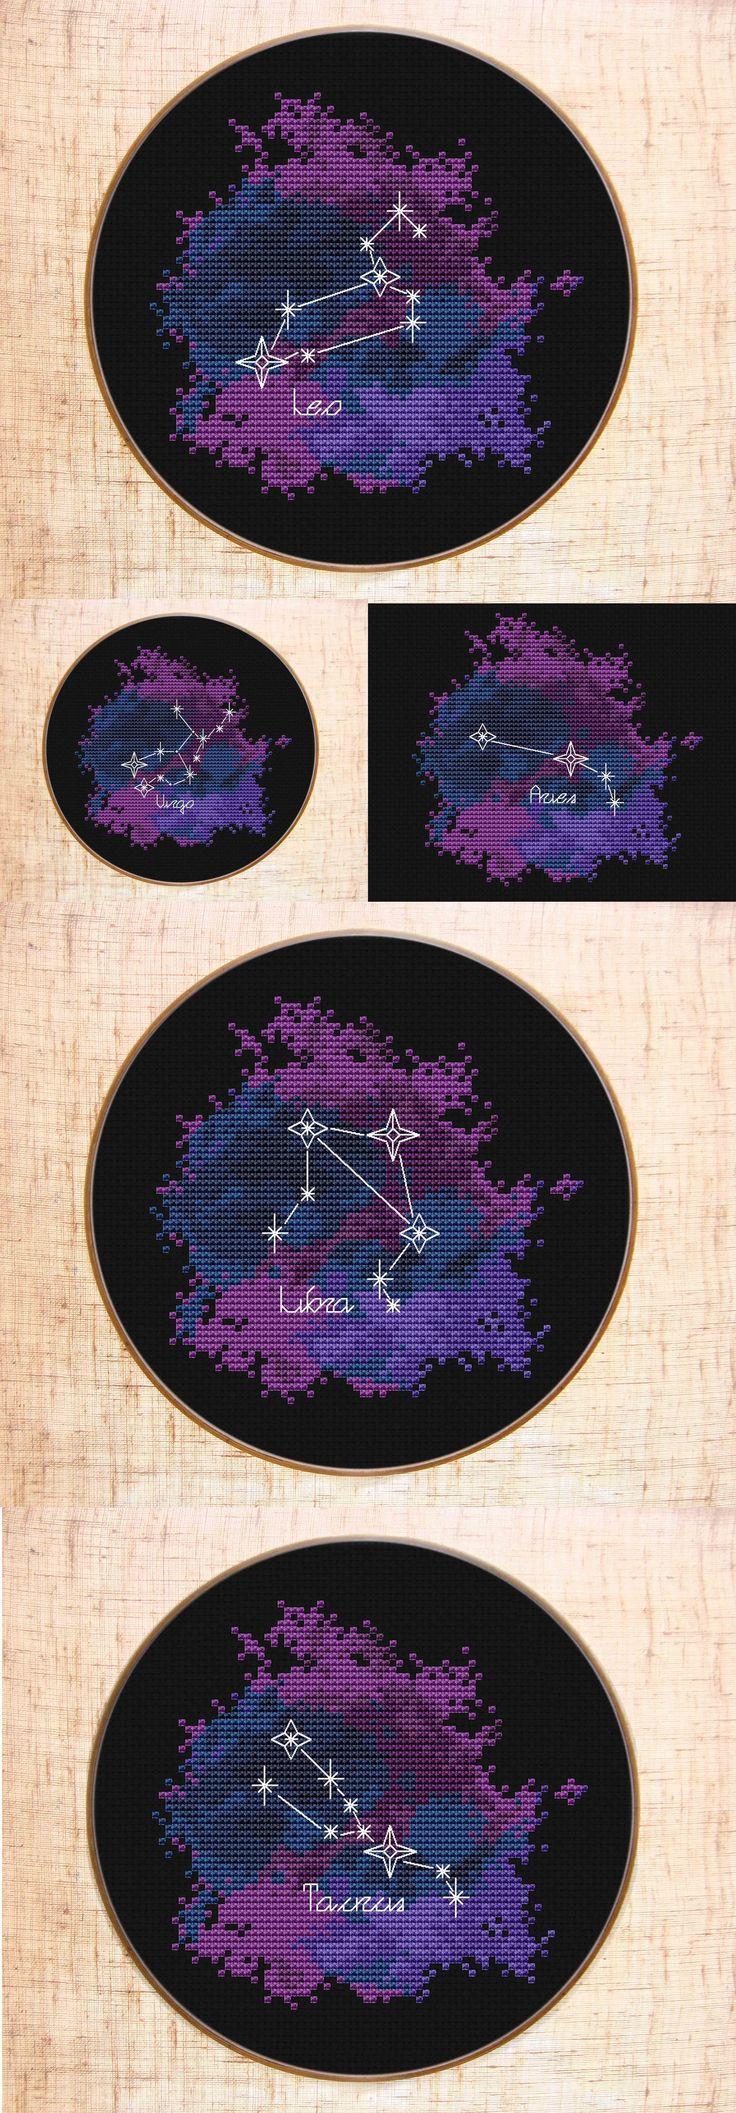 Constellation Cross stitch patterns | Zodiac sign cross stitch Galaxy | Celestial x-stitch